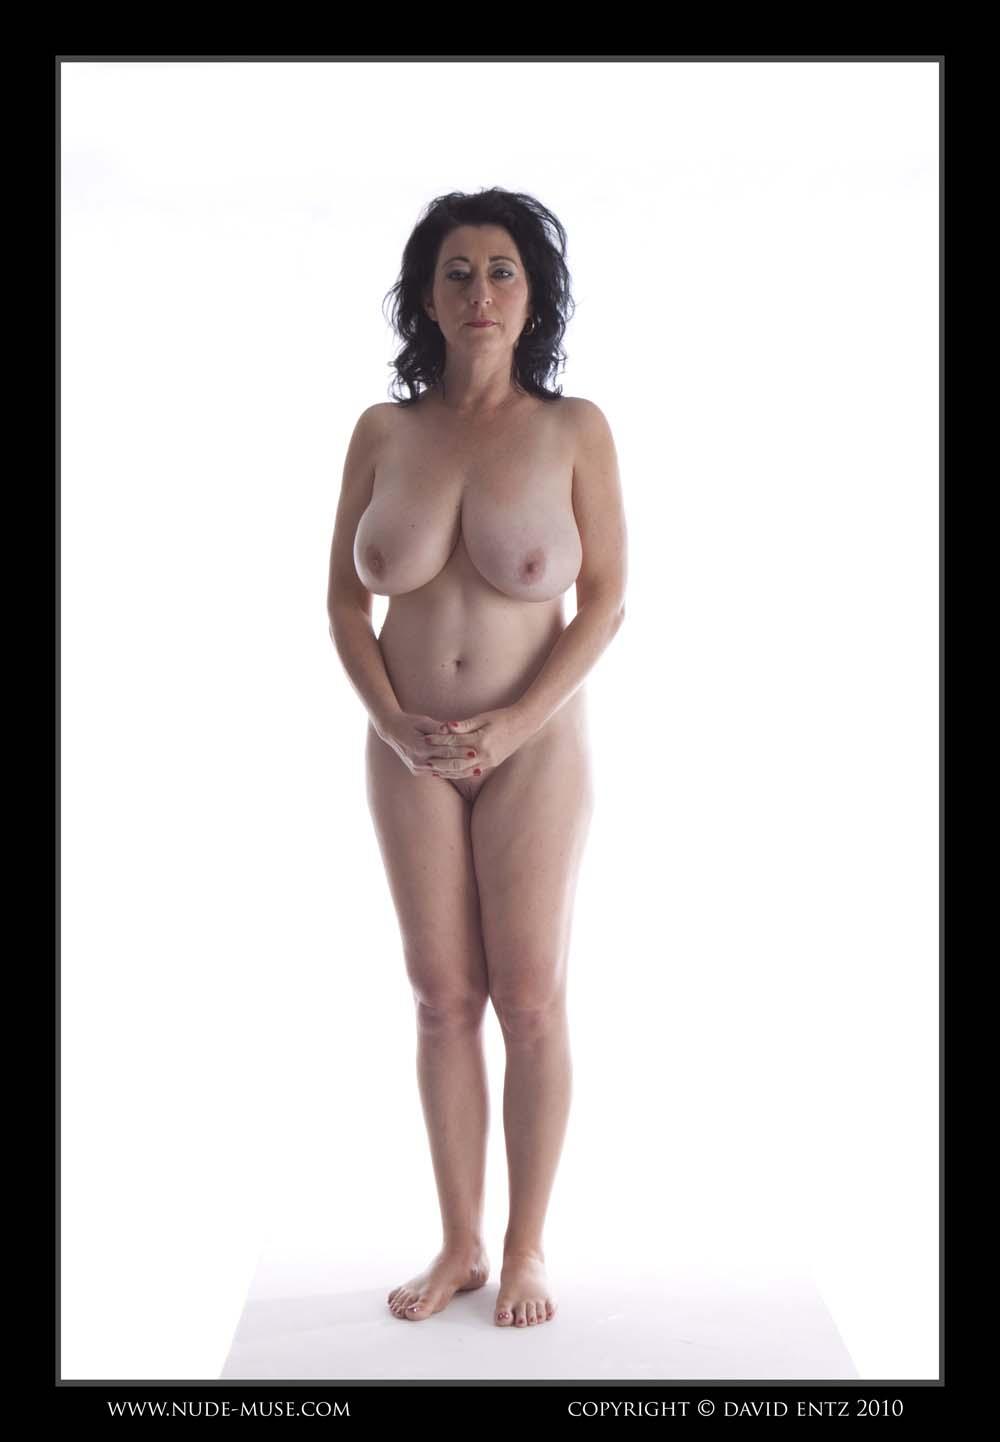 Xena naked vagina pics galaries nude gallery